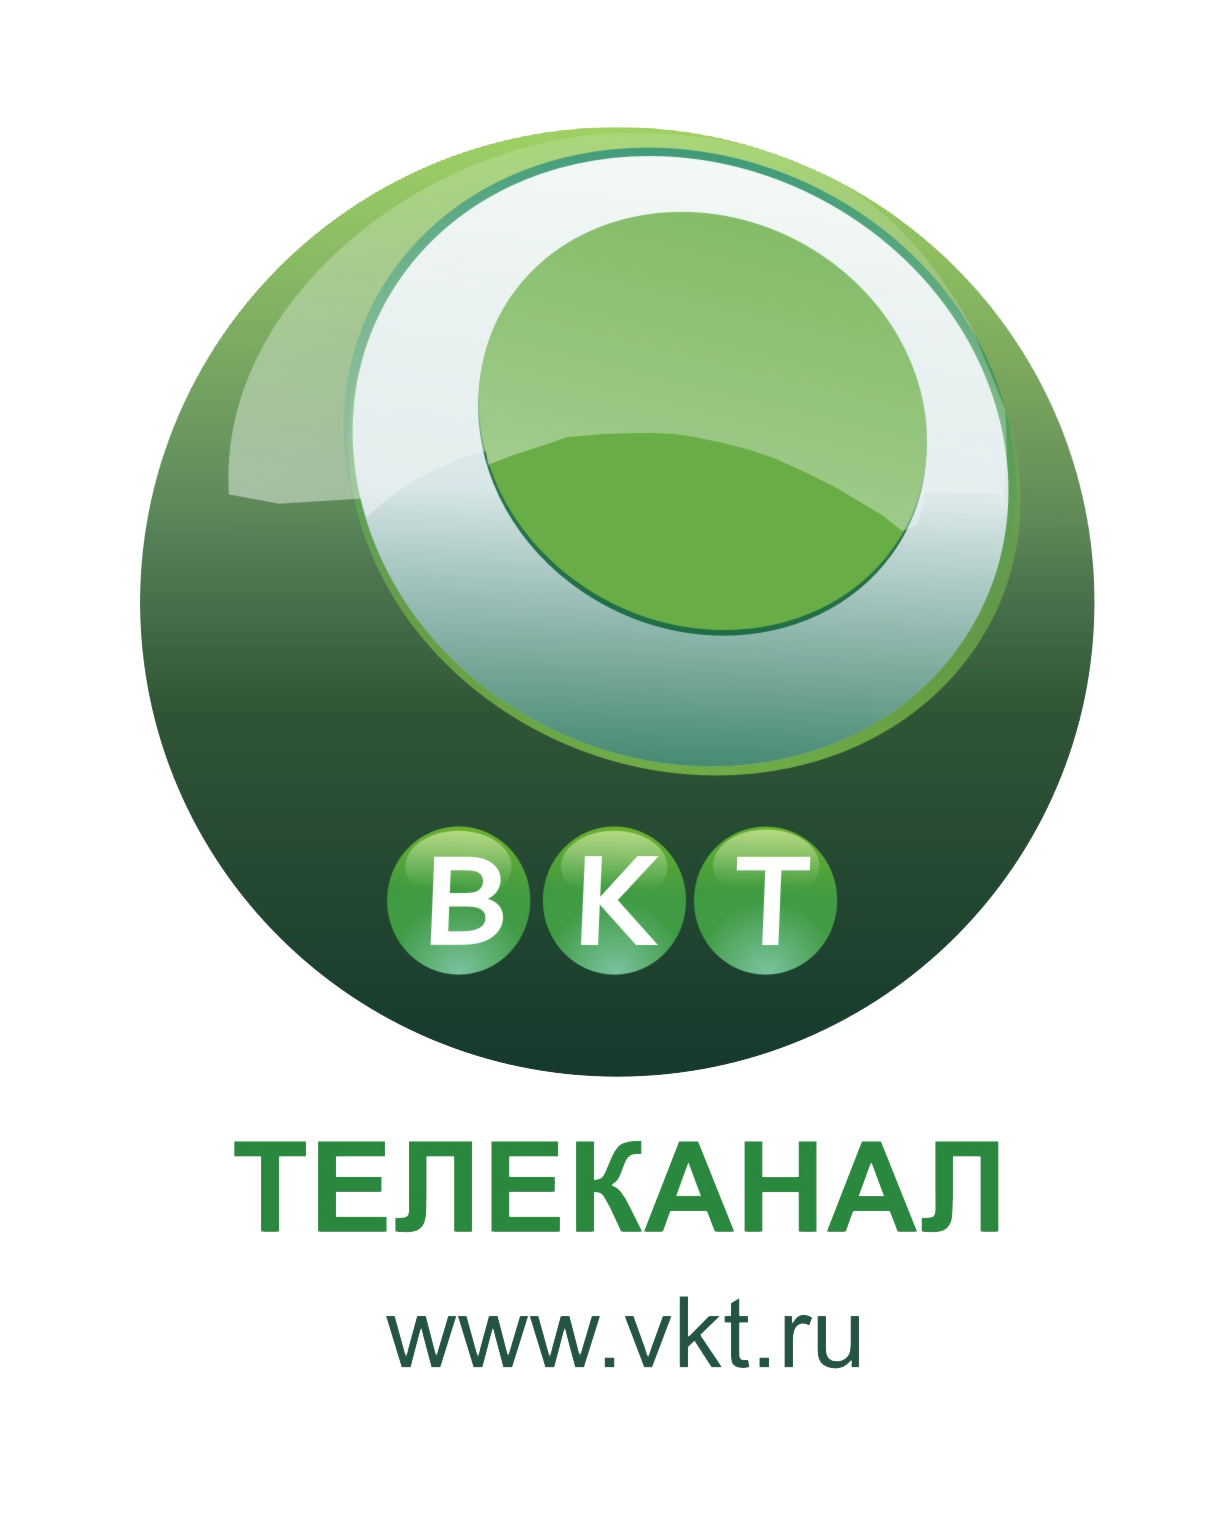 telekanal_VKT